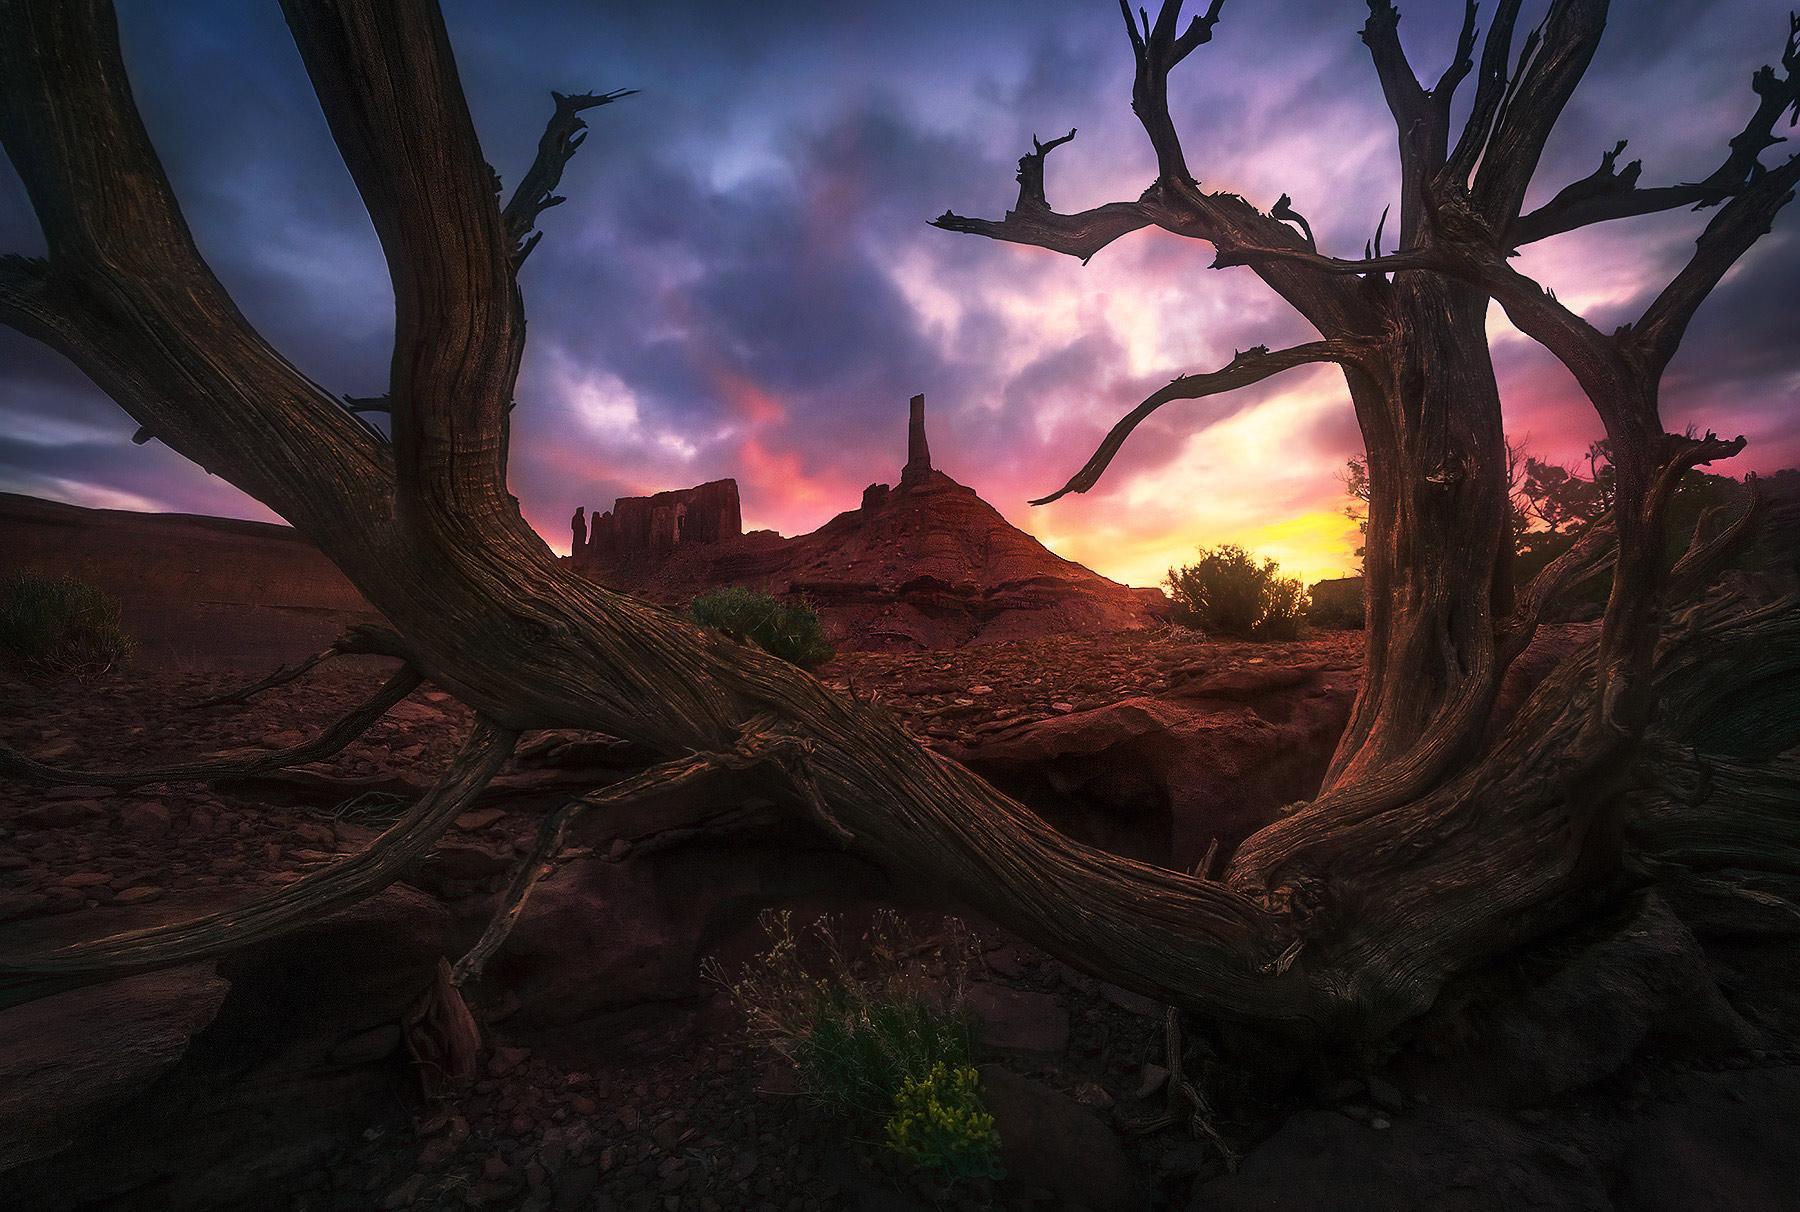 A unique composition of the famous tower at sunrise, Utah.